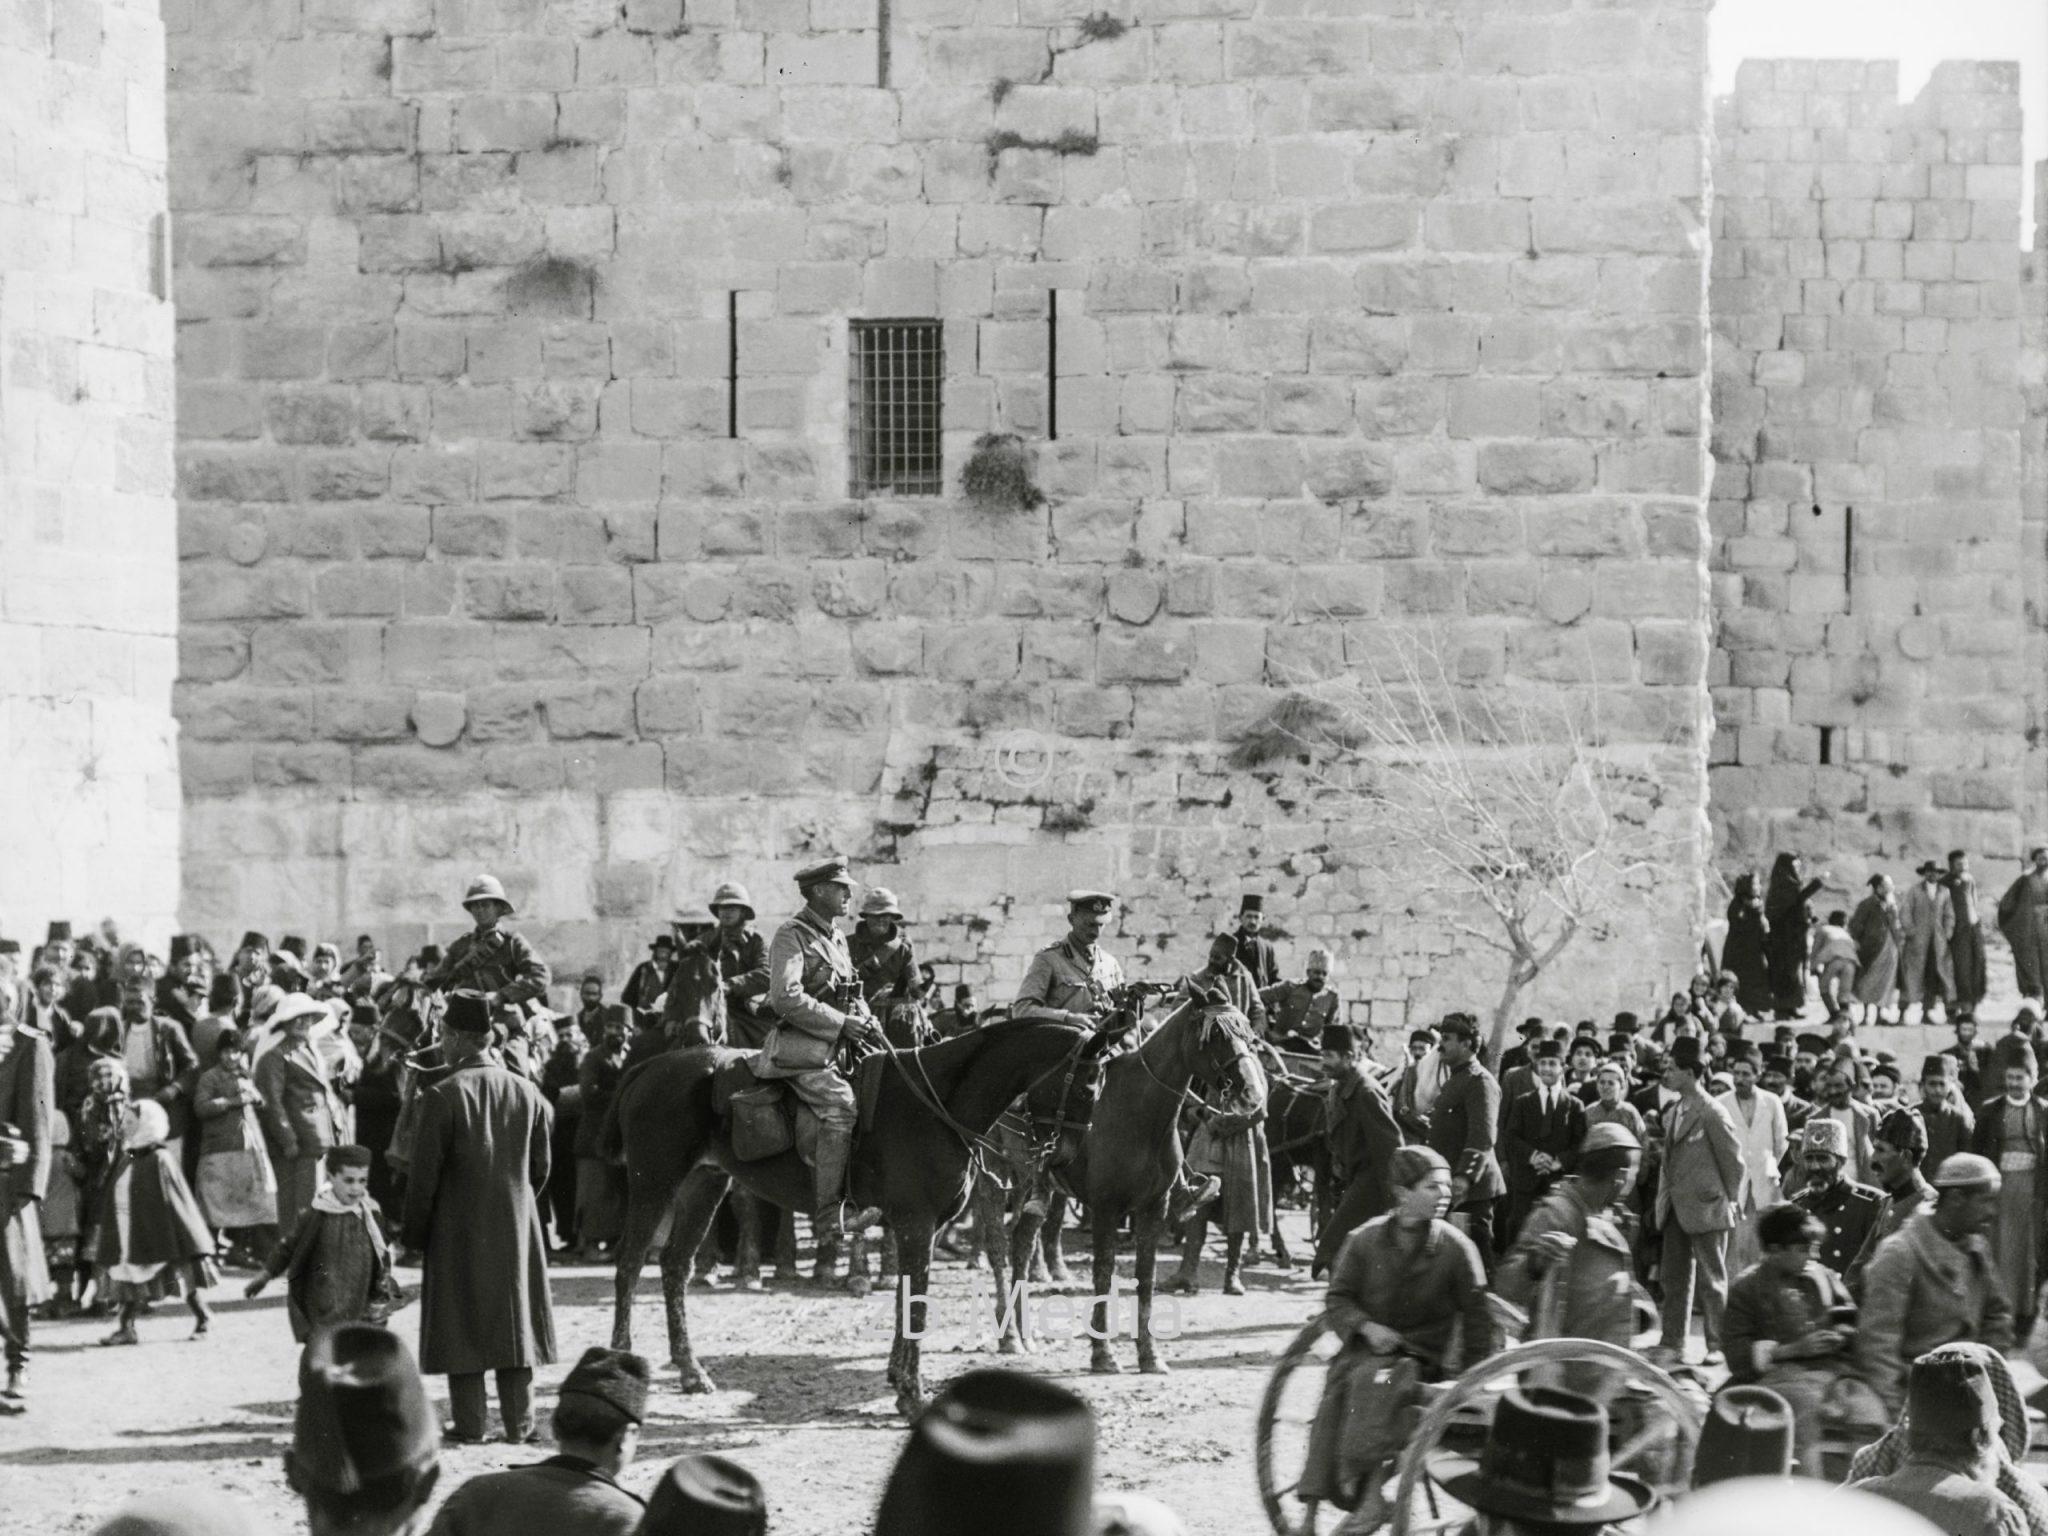 Kapitulation von Jerusalem 1917